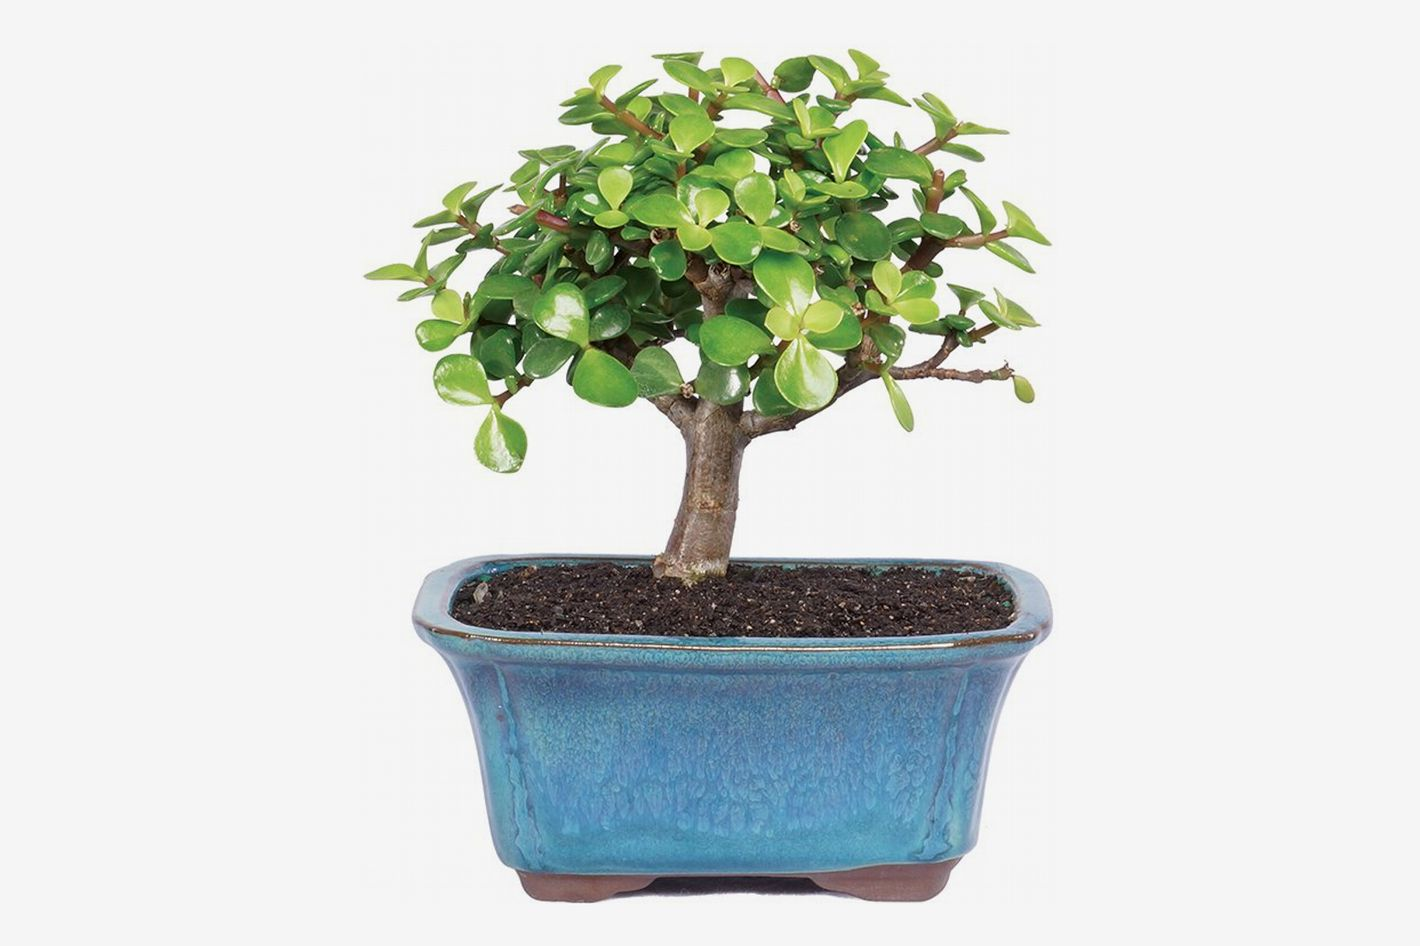 Brussel's Live Dwarf Jade Indoor Bonsai Tree